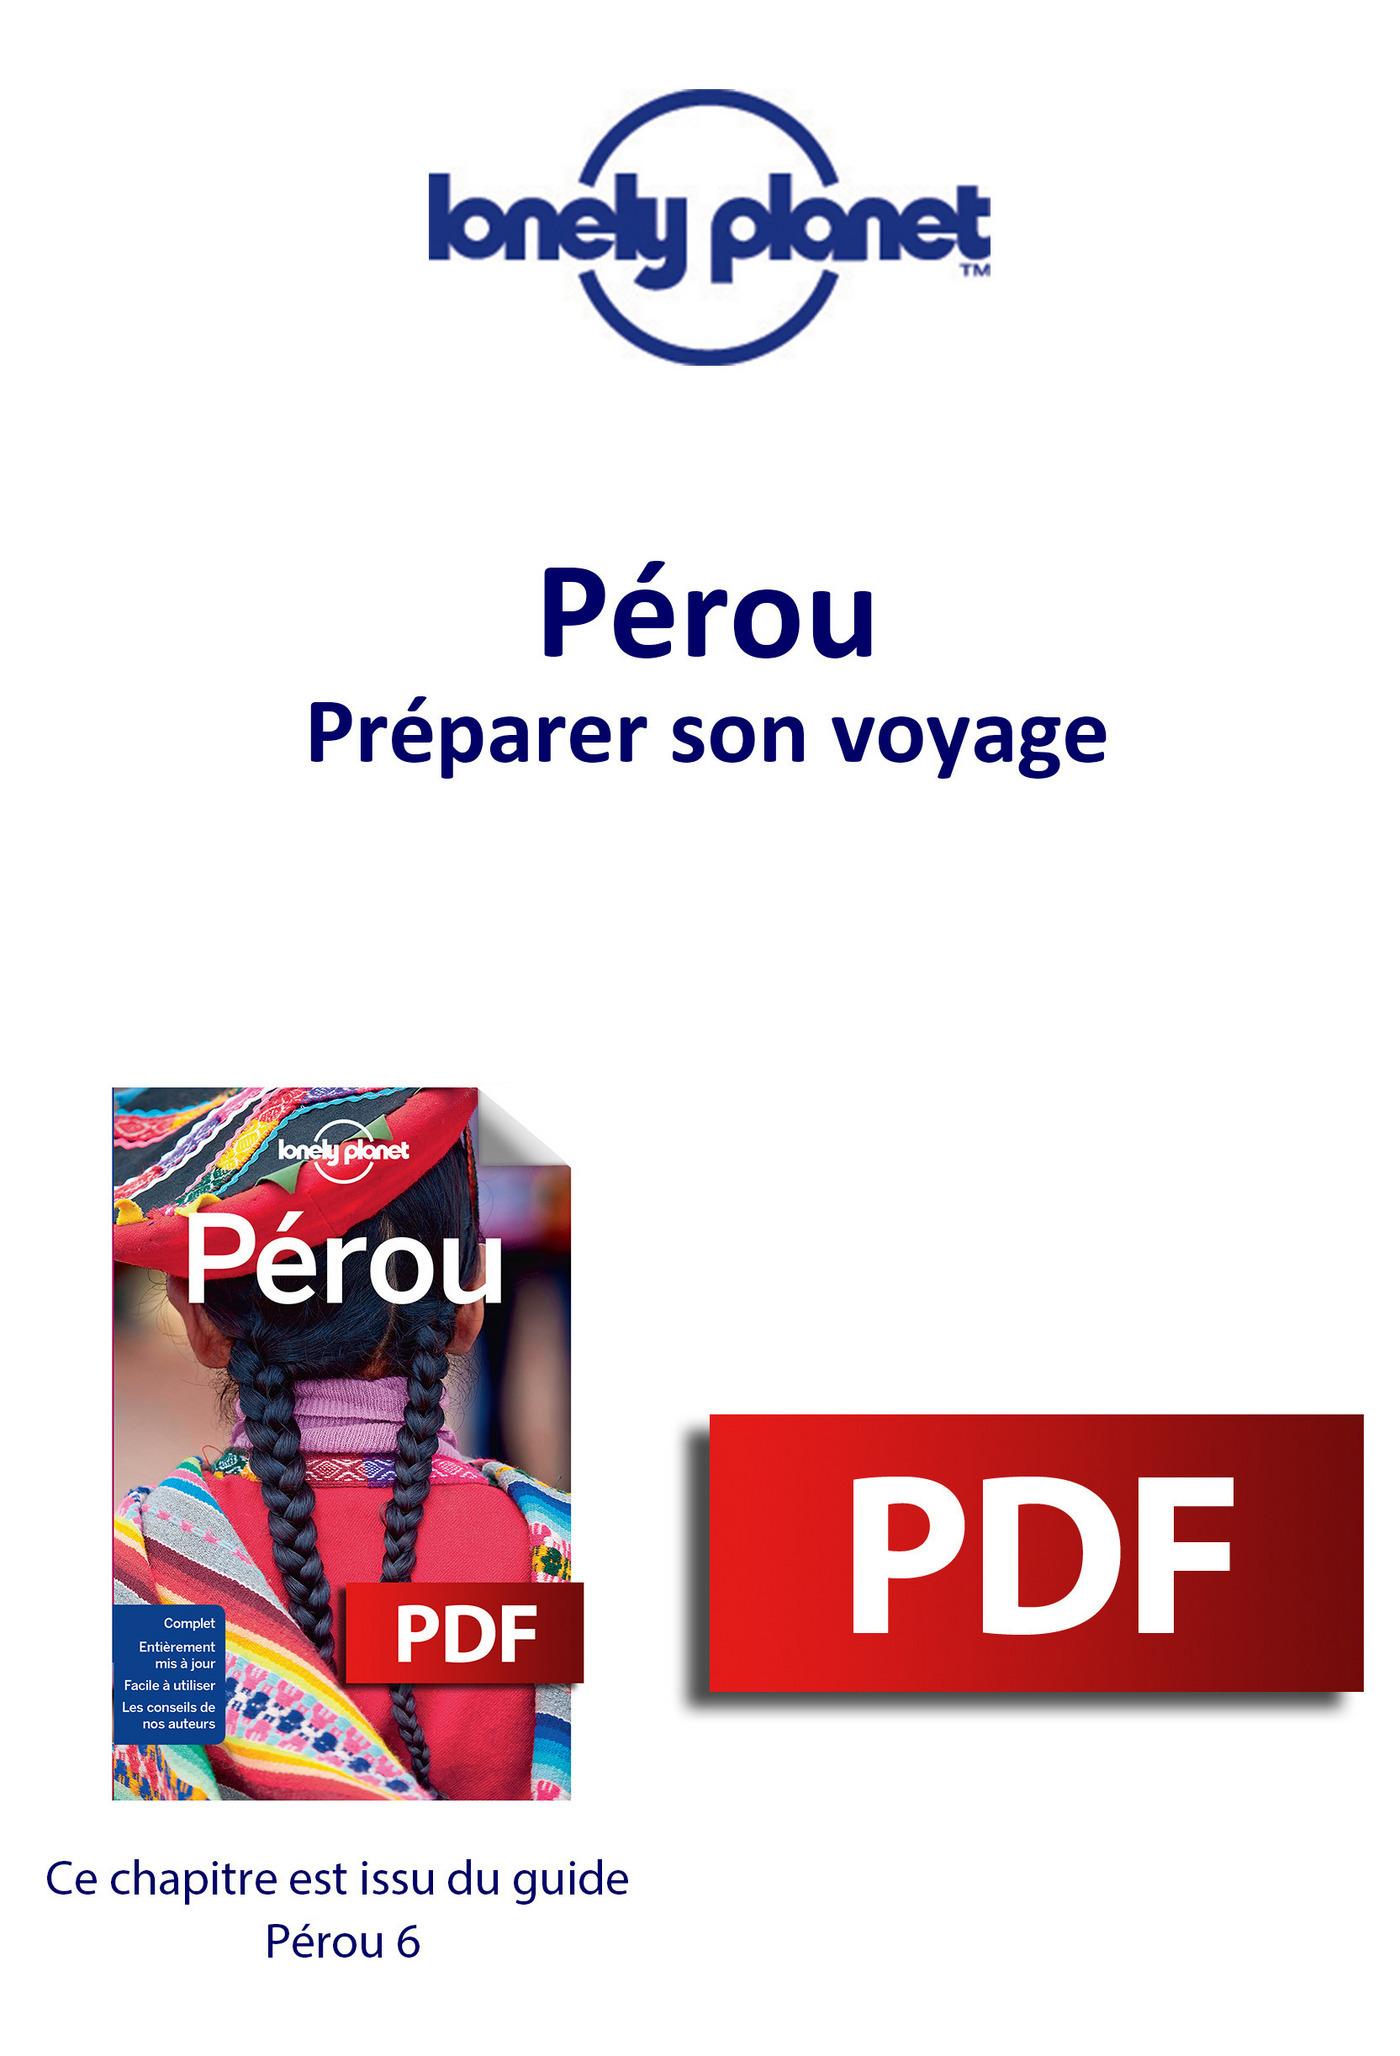 Pérou - Préparer son voyage